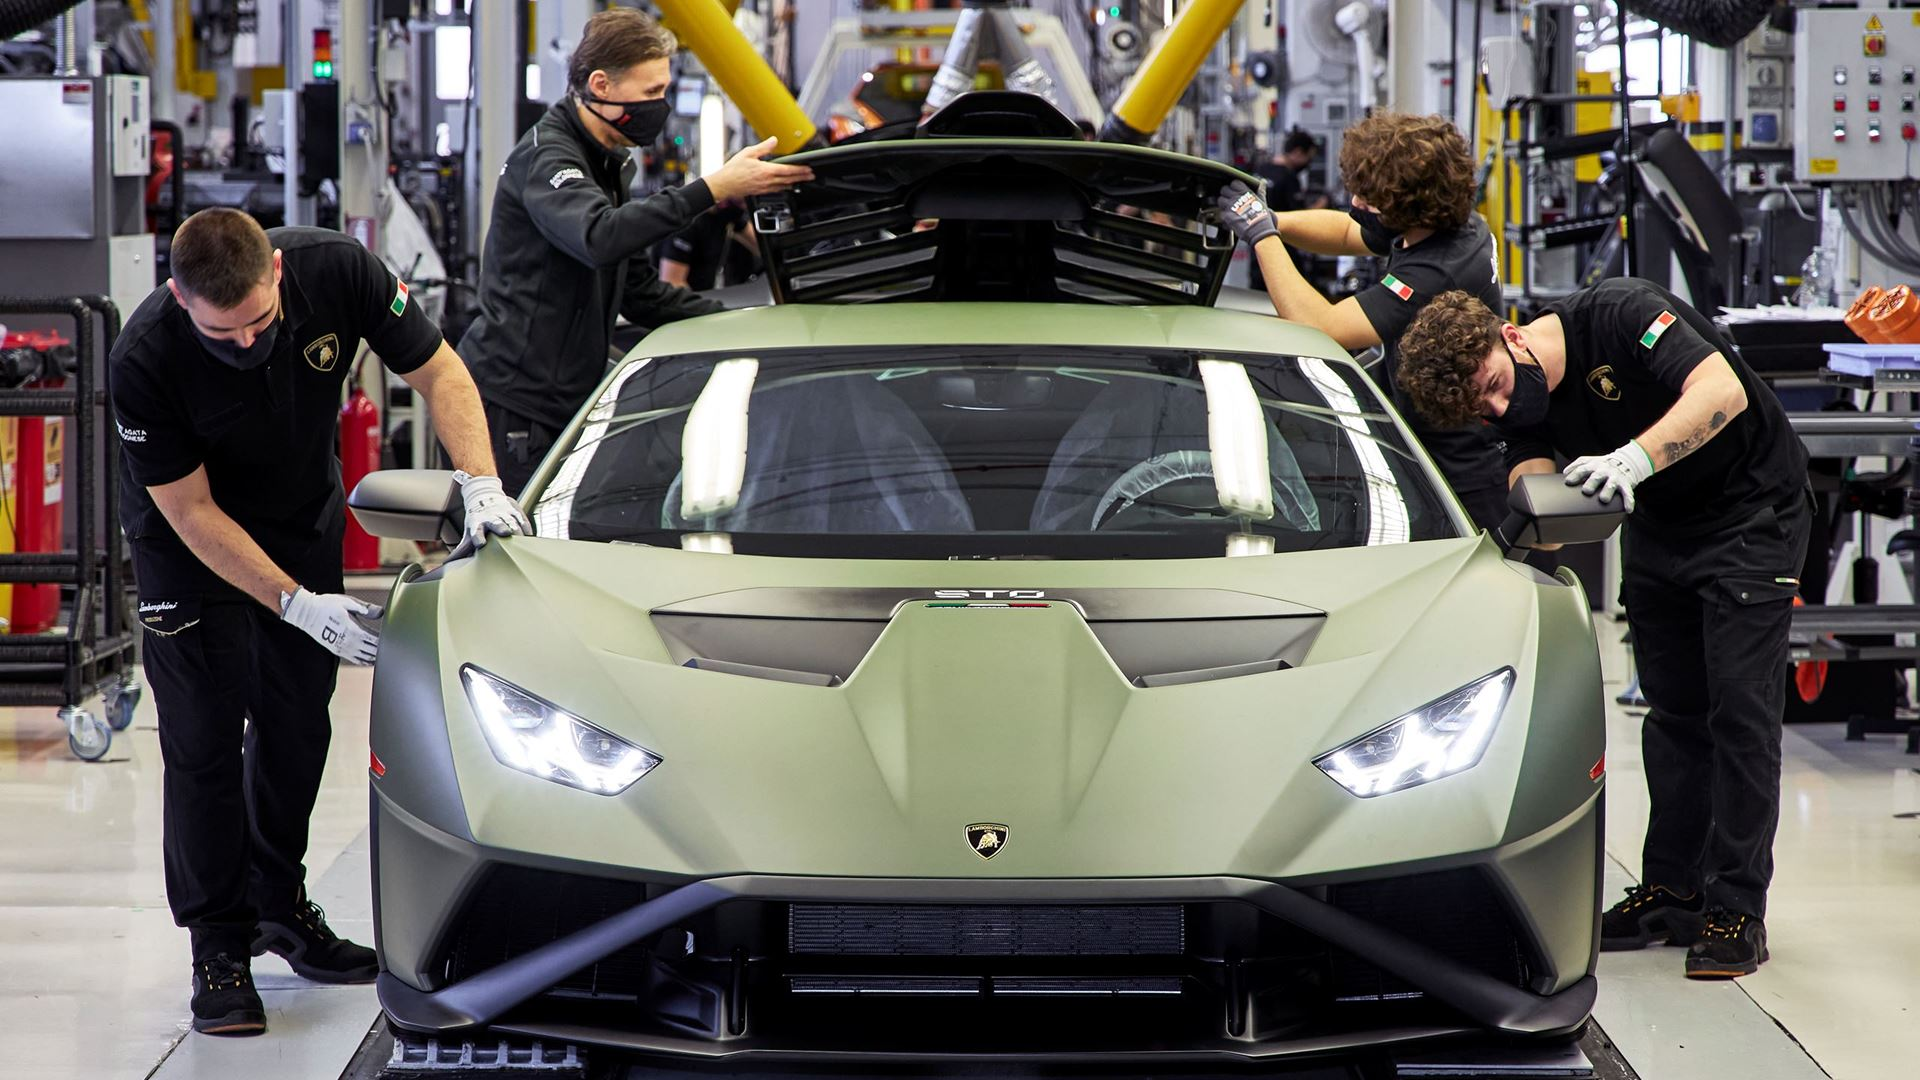 Automobili Lamborghini: sales soaring, record first quarter - Image 4